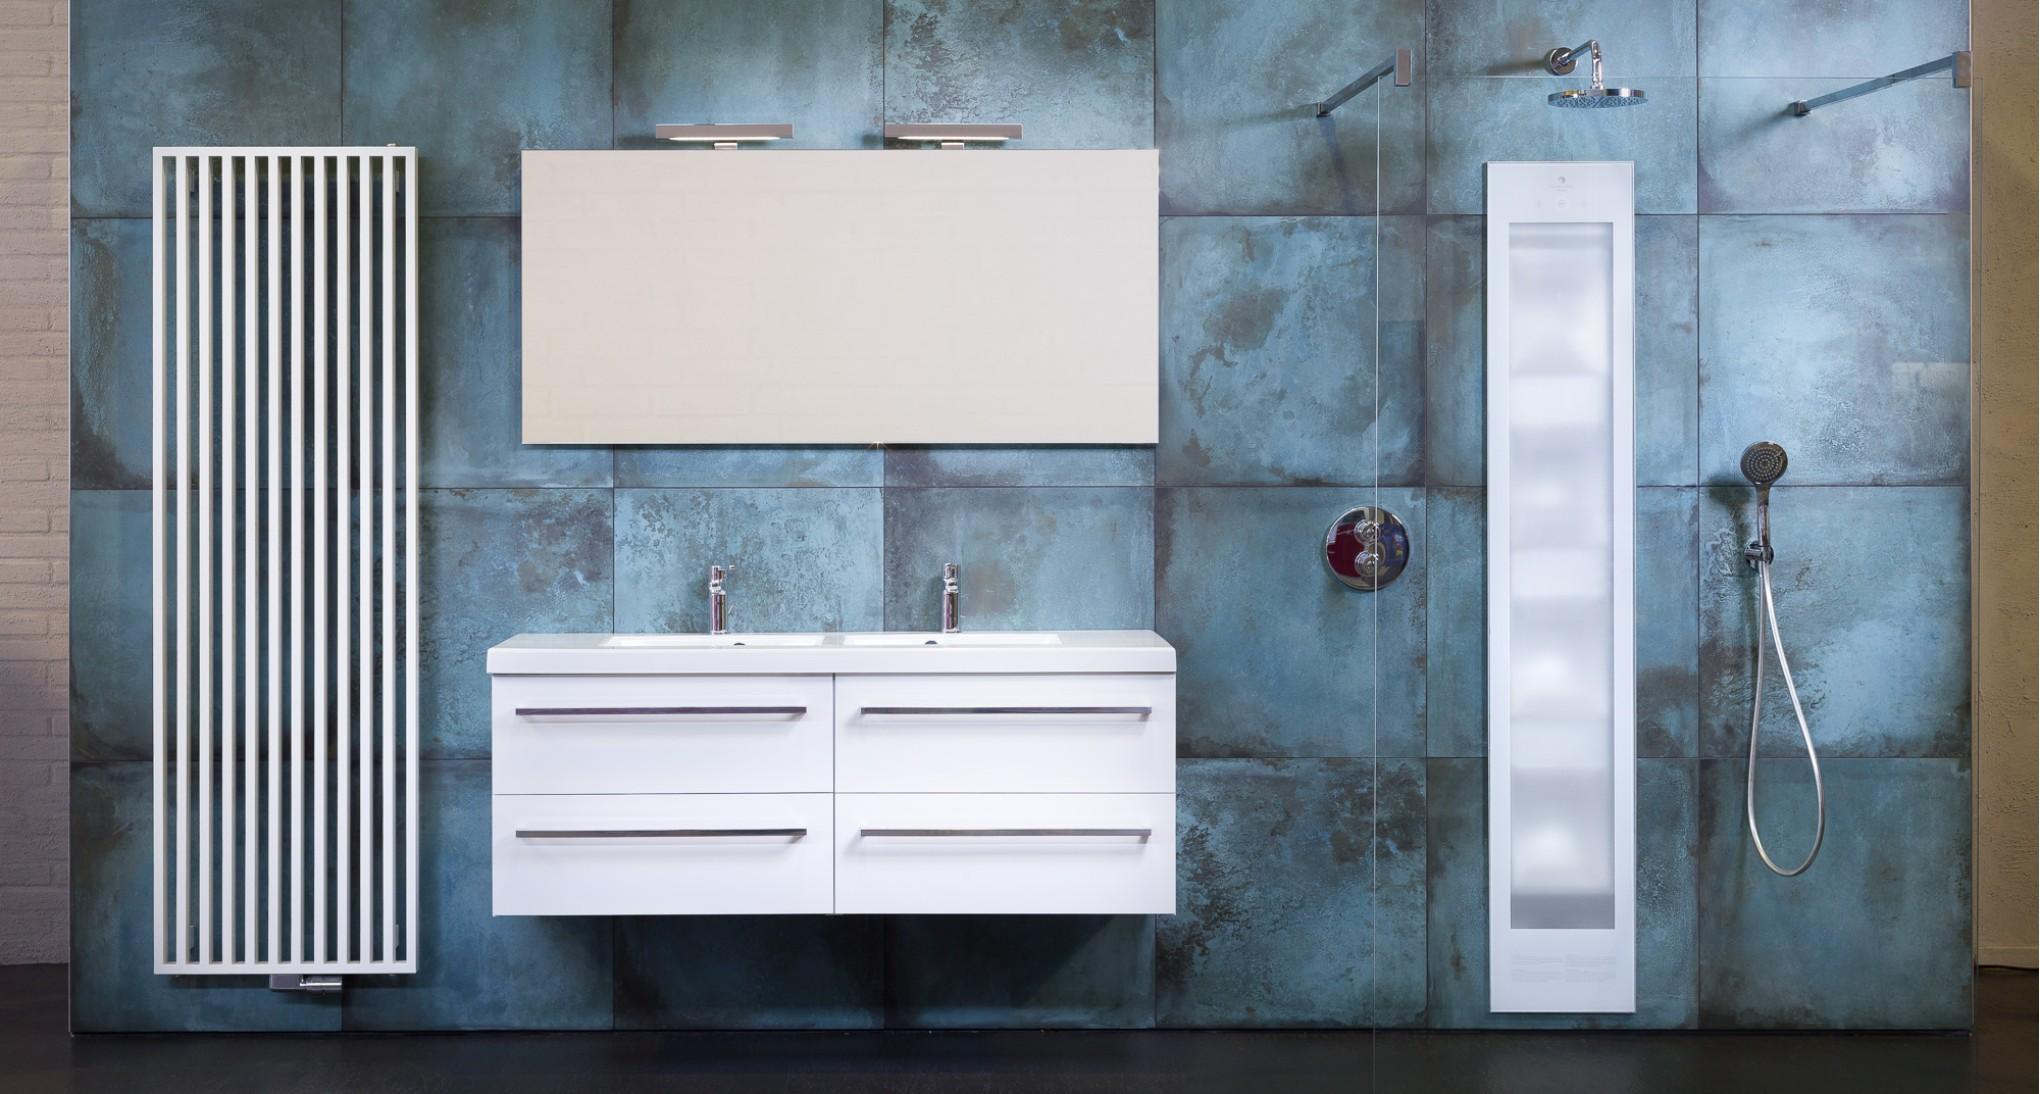 Concordia keuken & bad badkamers lichte design badkamer